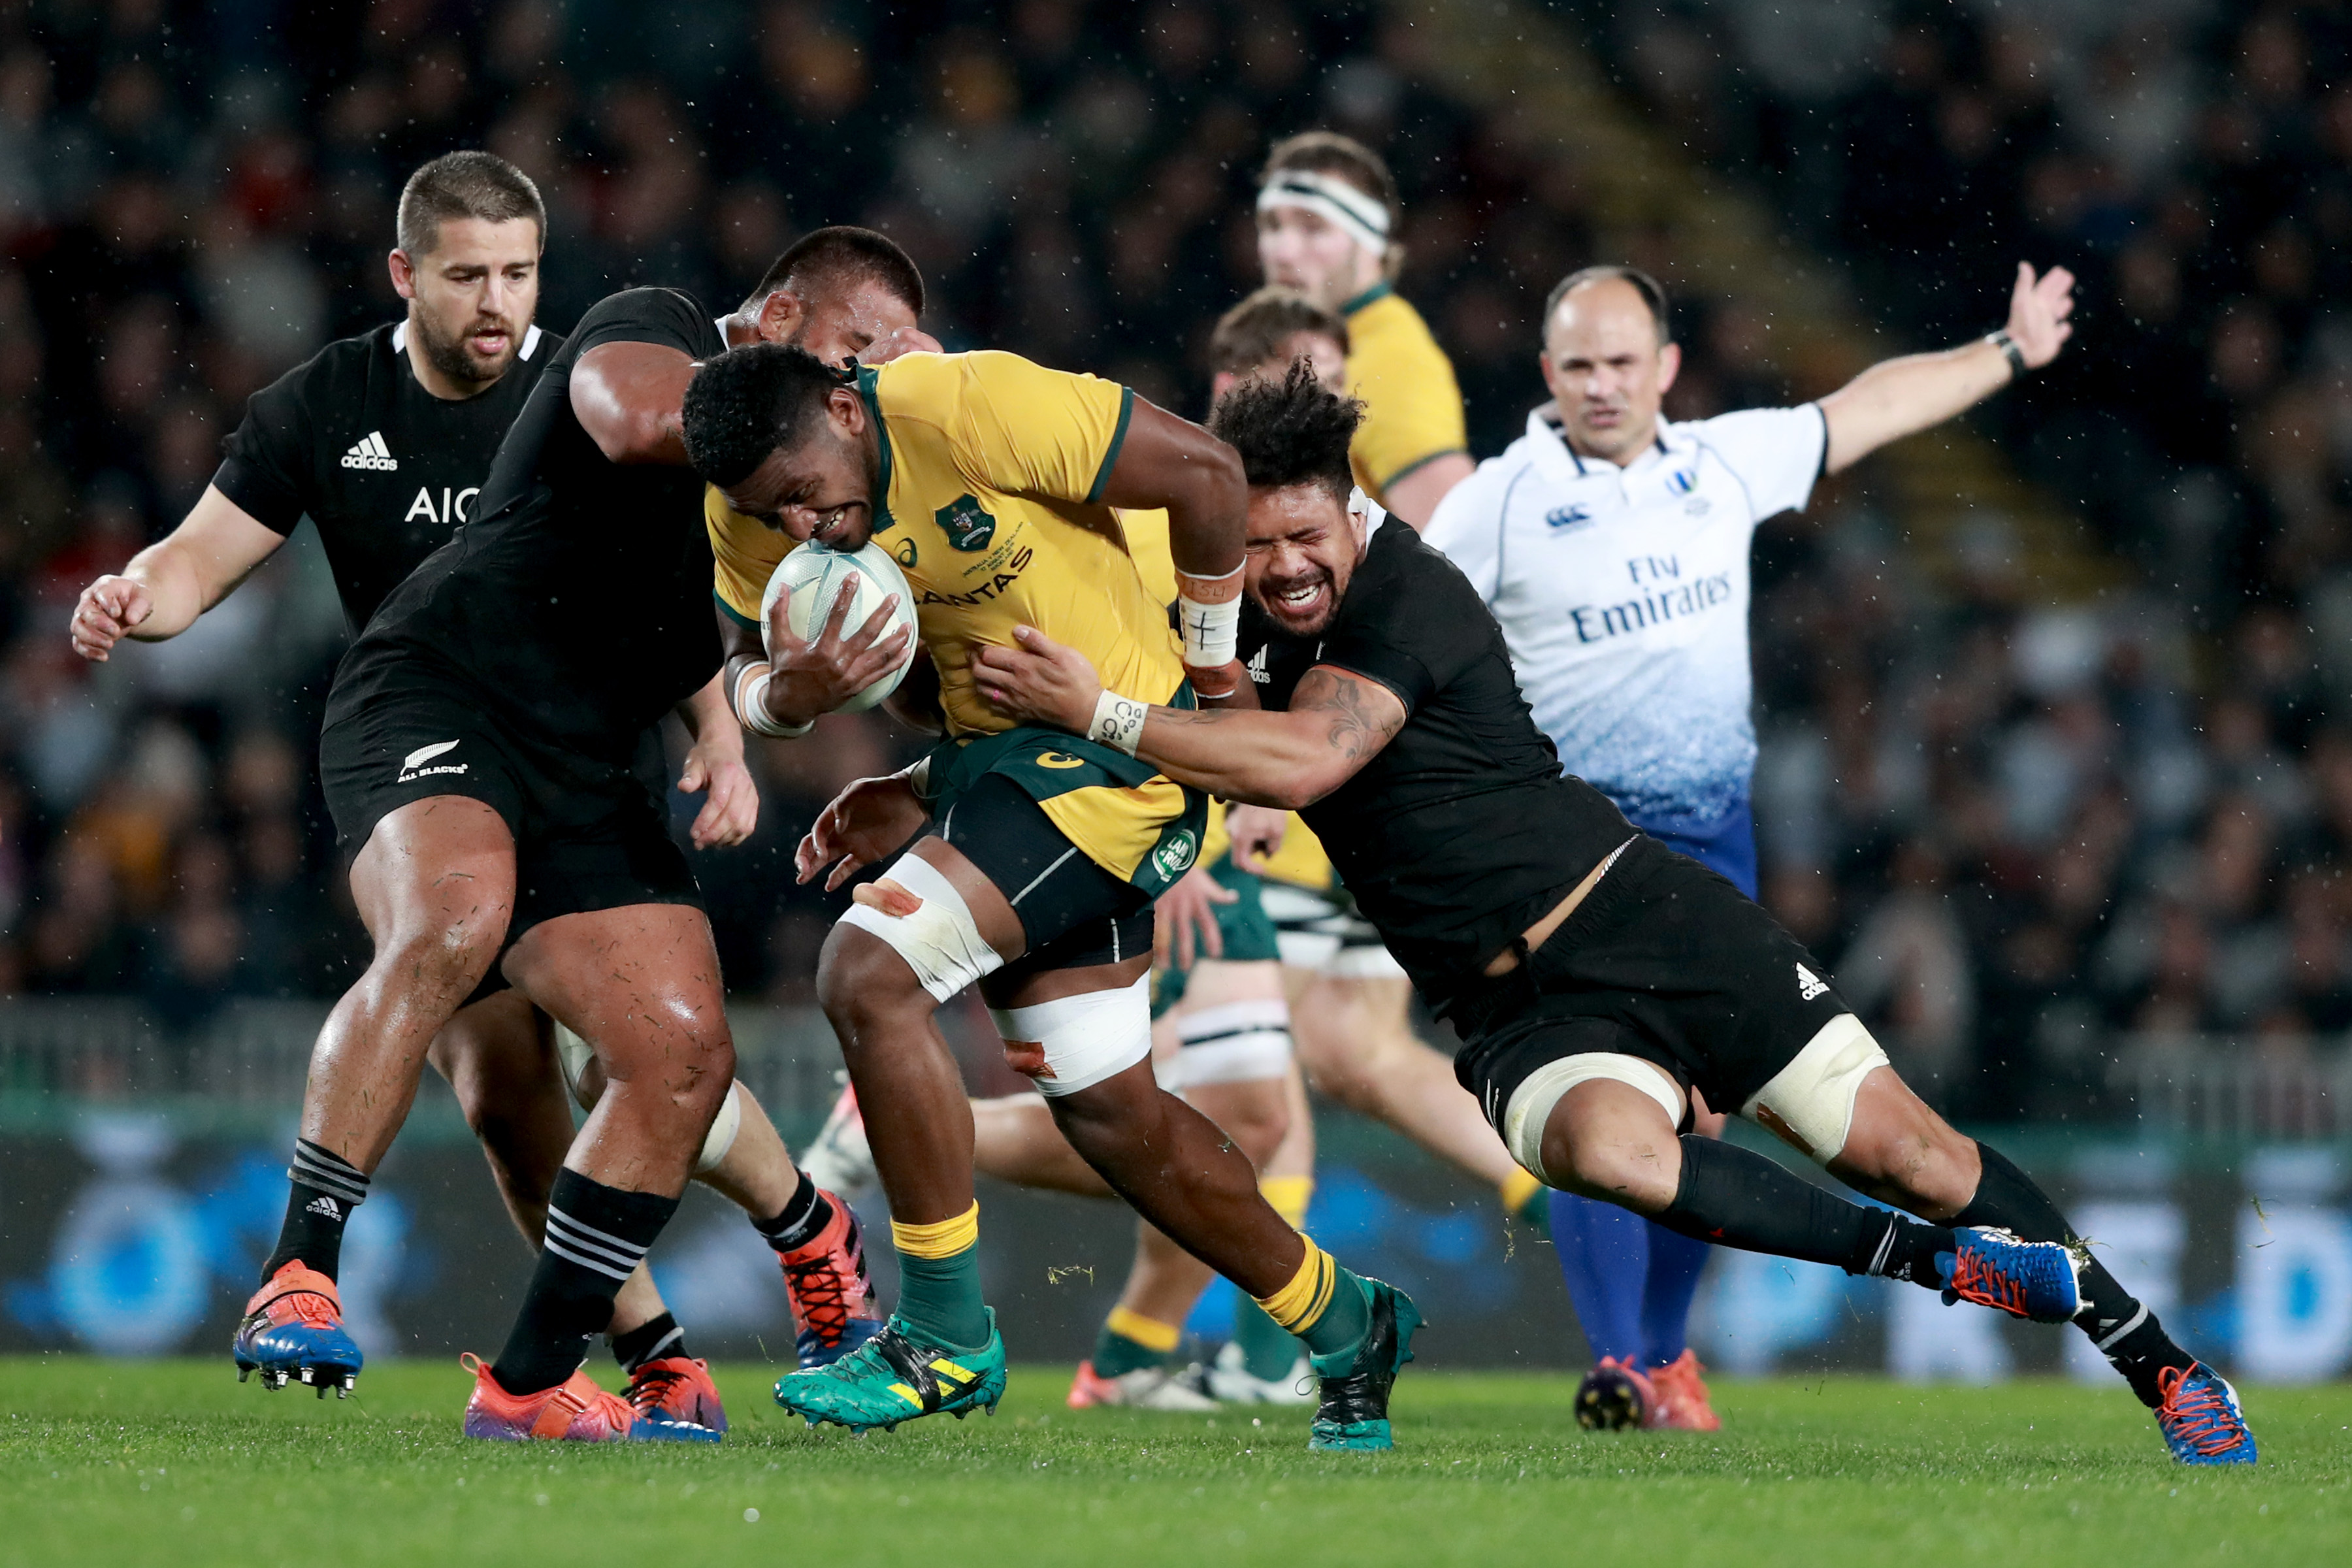 australia vs all blacks rugby 2019